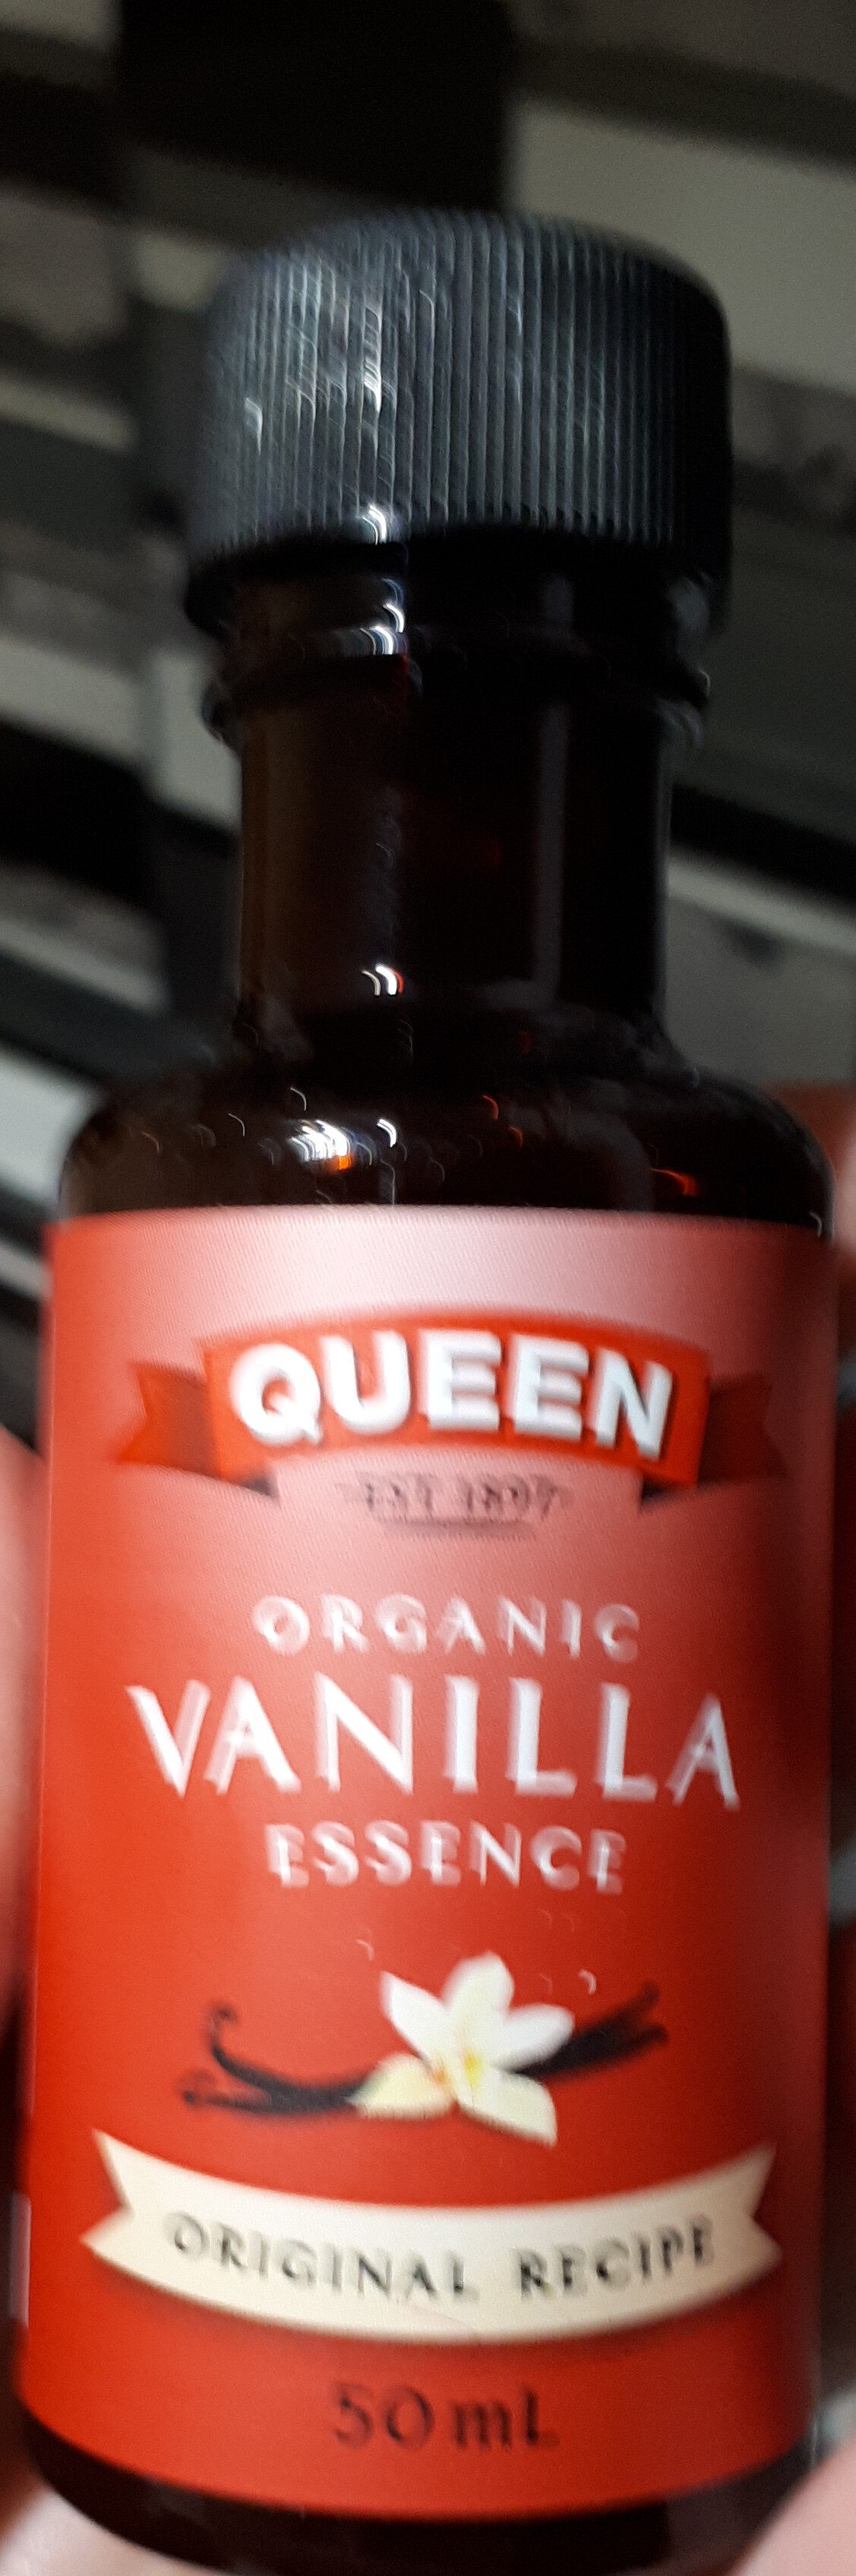 Organic vanilla essence - Product - en